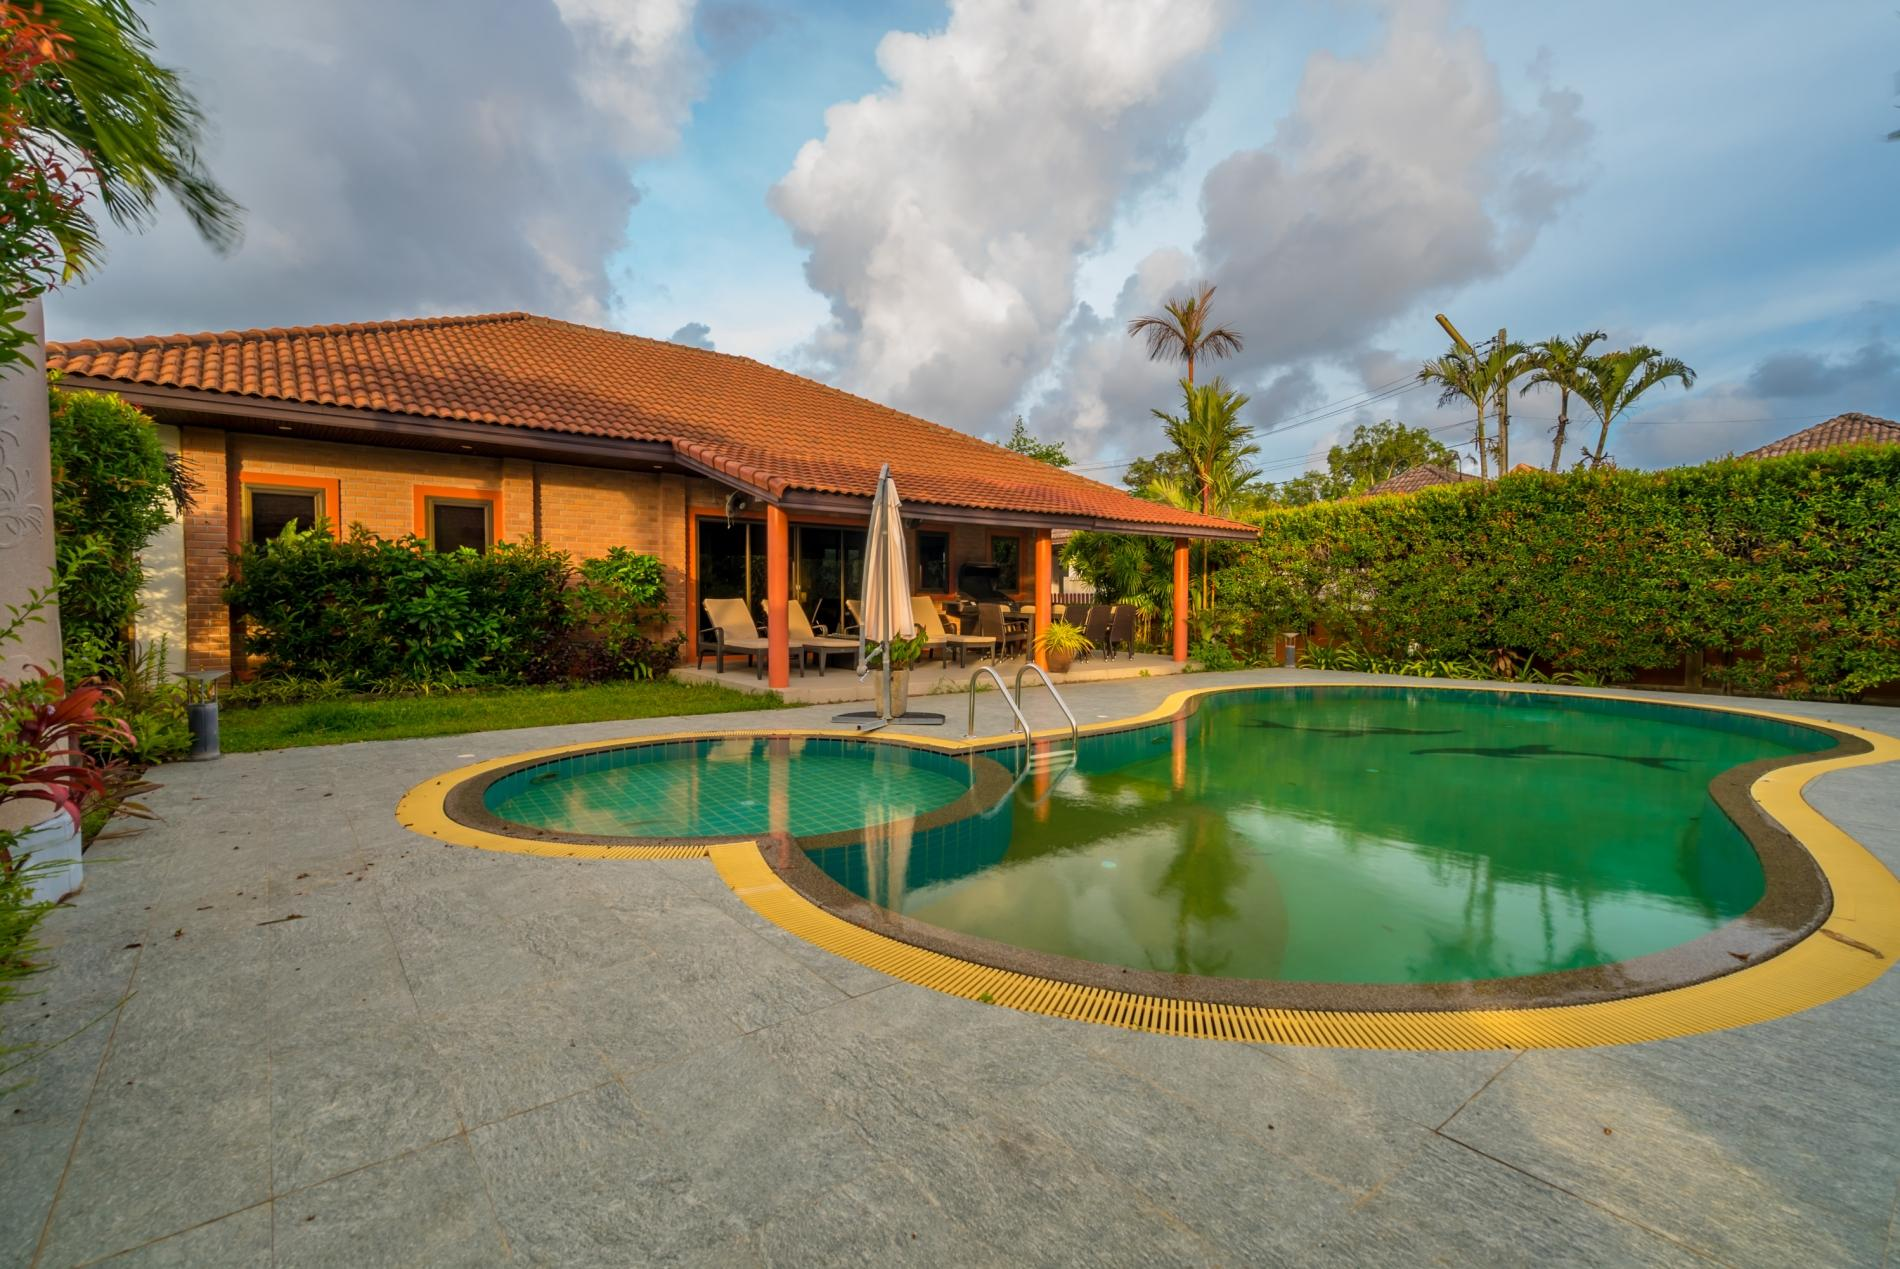 Pasak soi 3 - Convenient pool villa in quiet location, near Laguna, Boat avenue photo 8292543